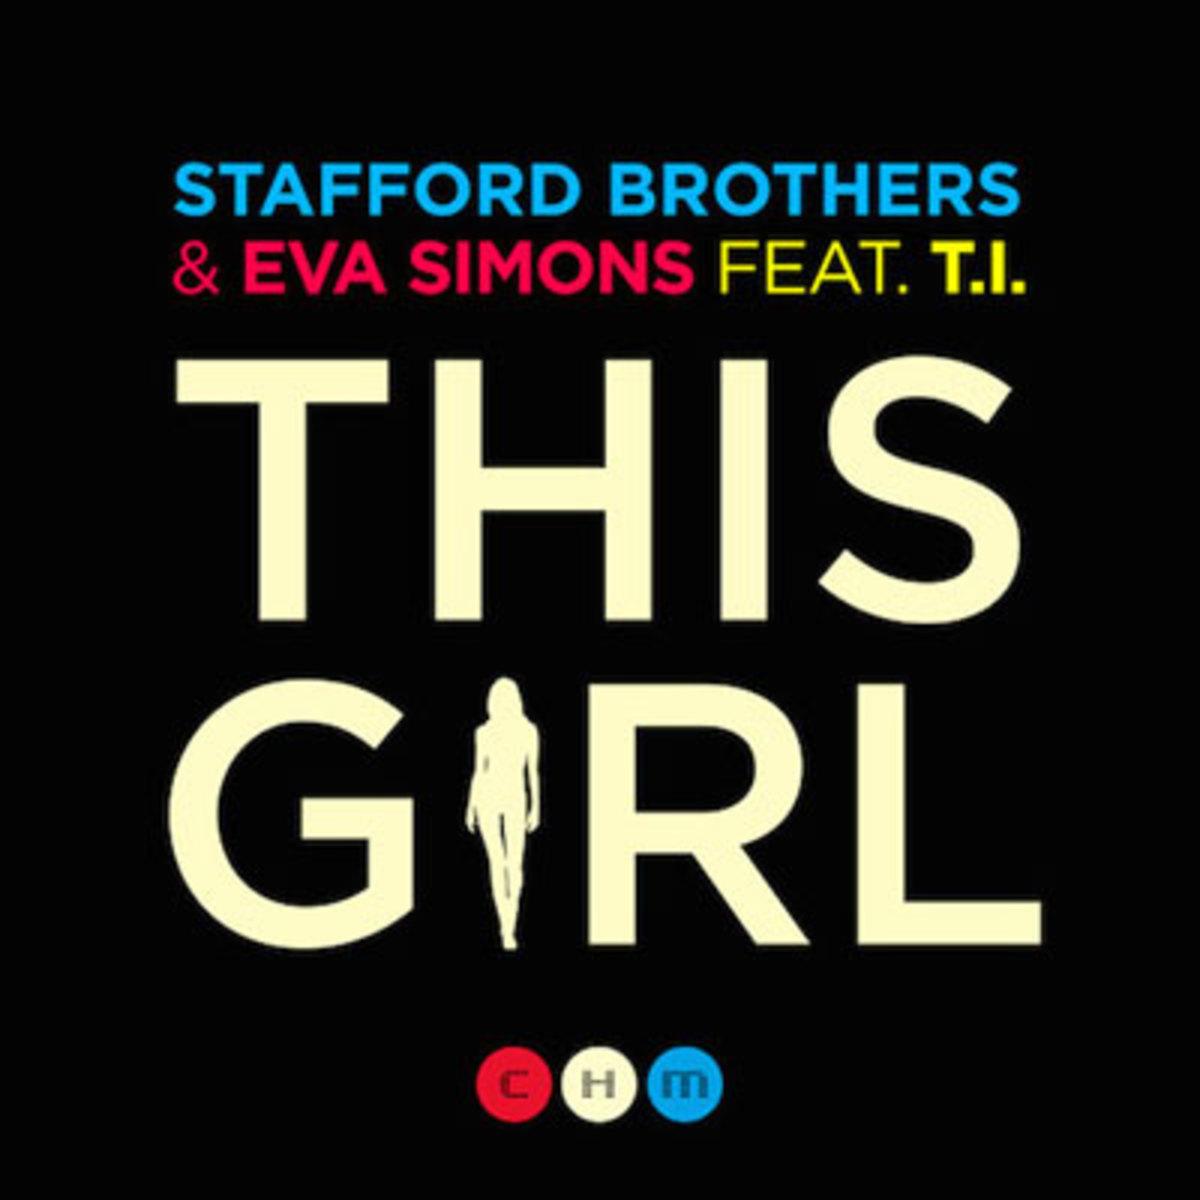 staffordbrothers-thisgirl.jpg